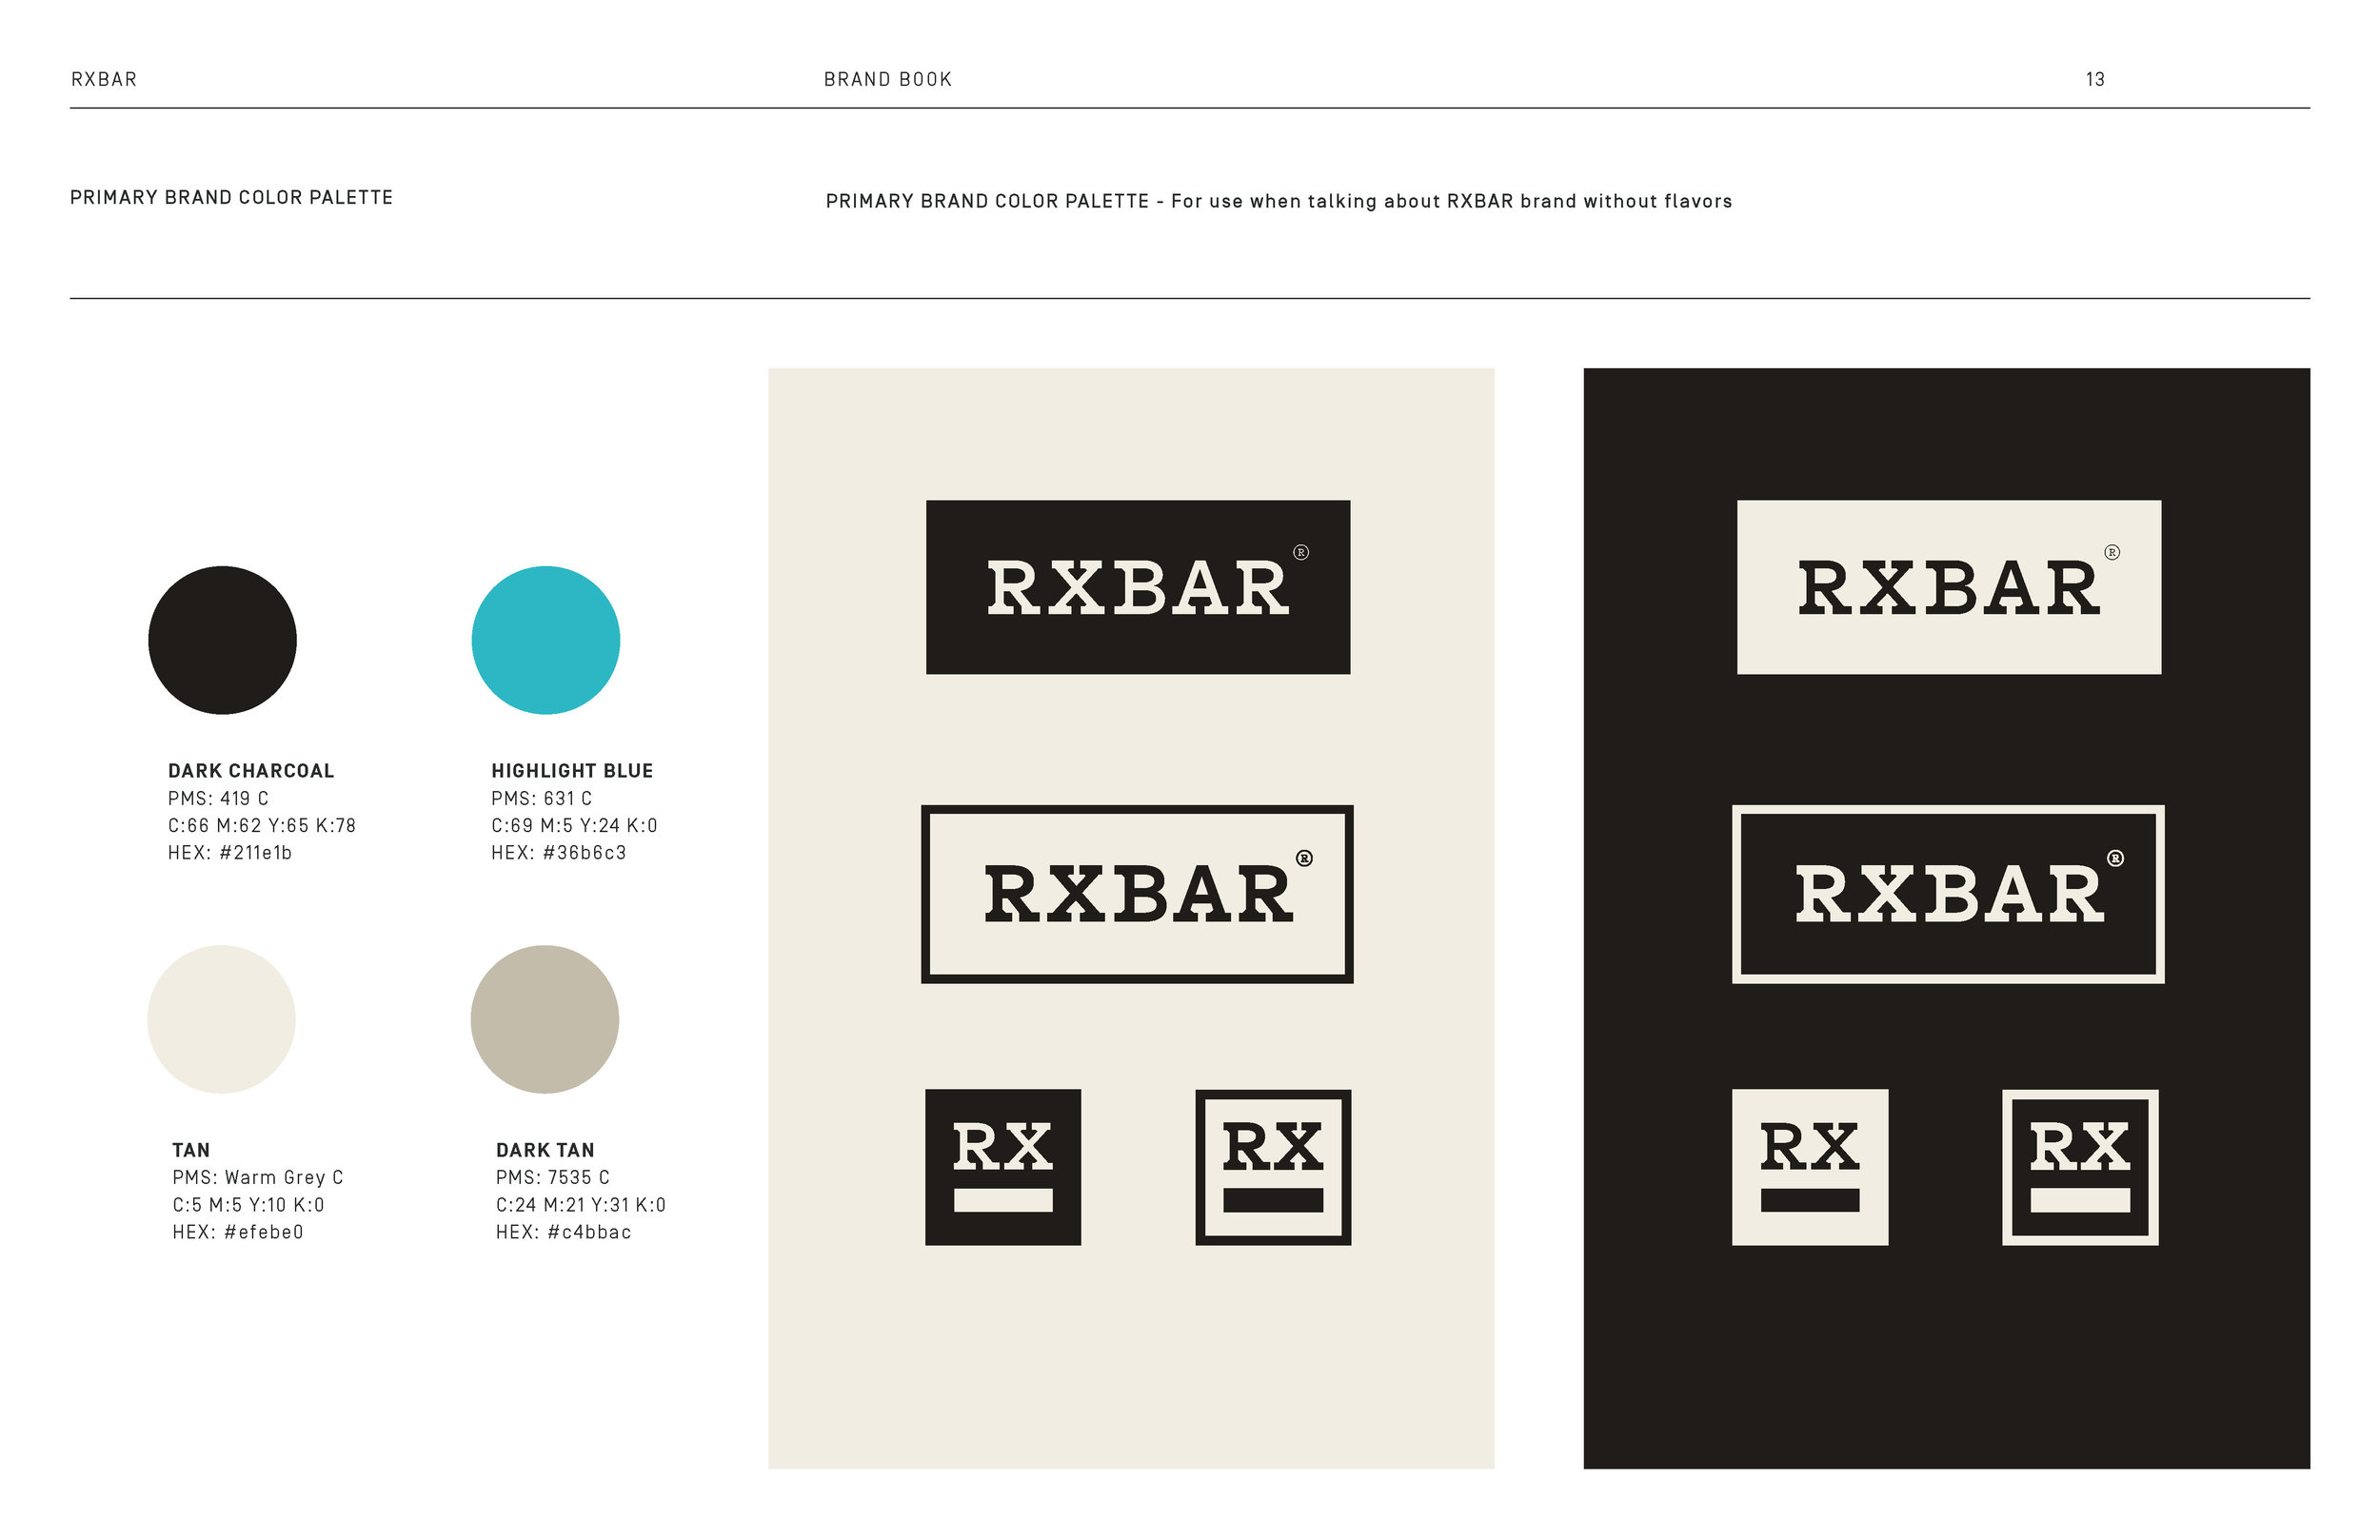 RXBAR_Brand guide_mwf_Page_13.jpg